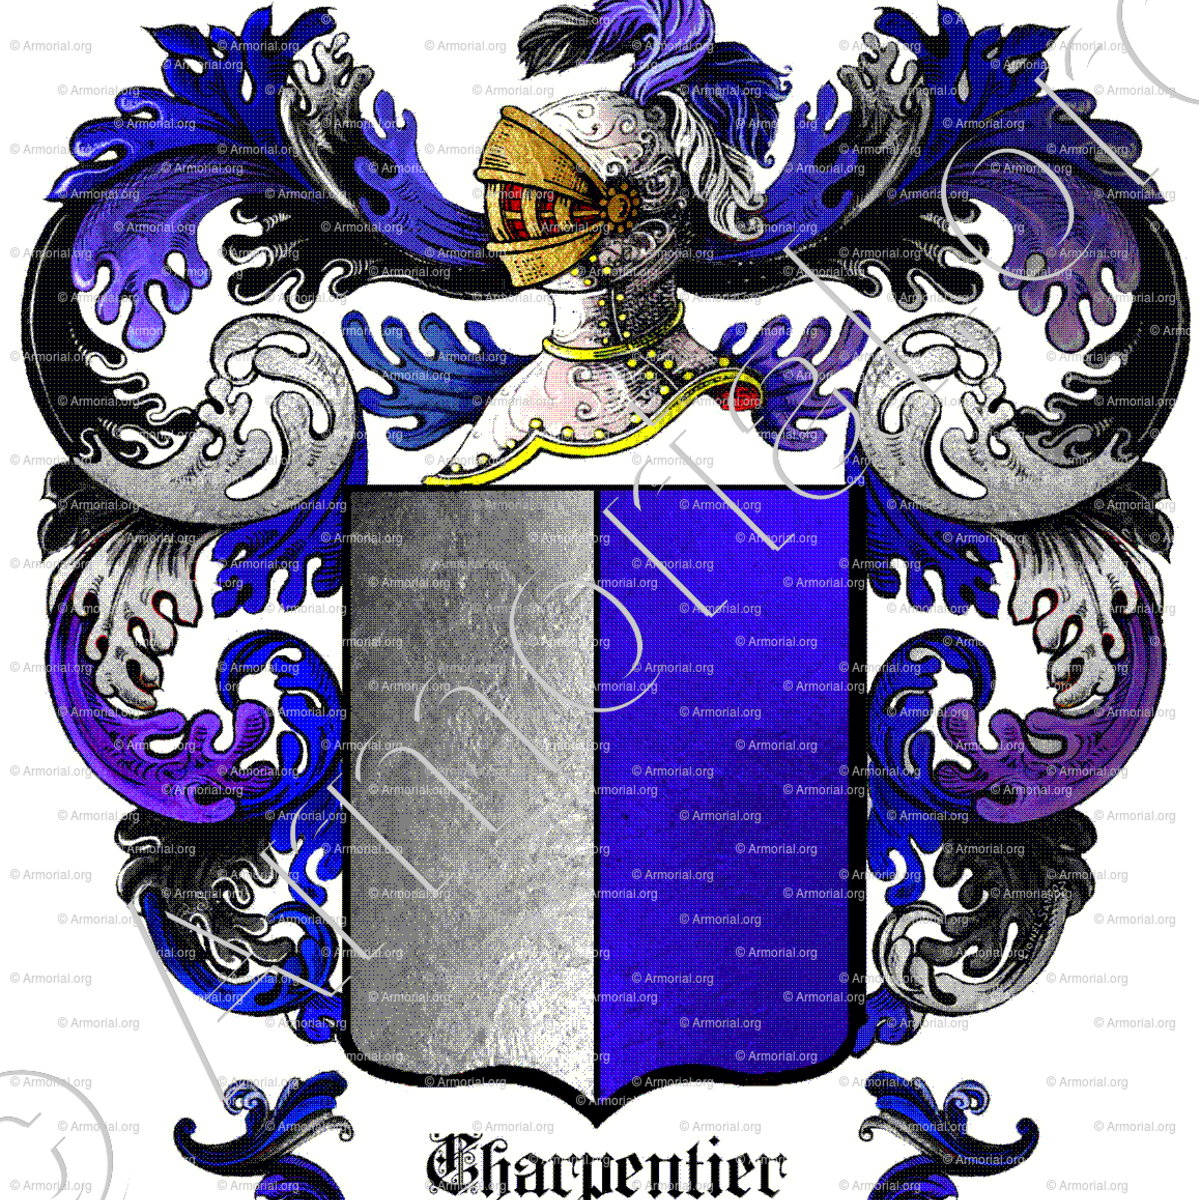 charpentier armoiries blason etymologie et origine nom de famille genealogie anc tres. Black Bedroom Furniture Sets. Home Design Ideas